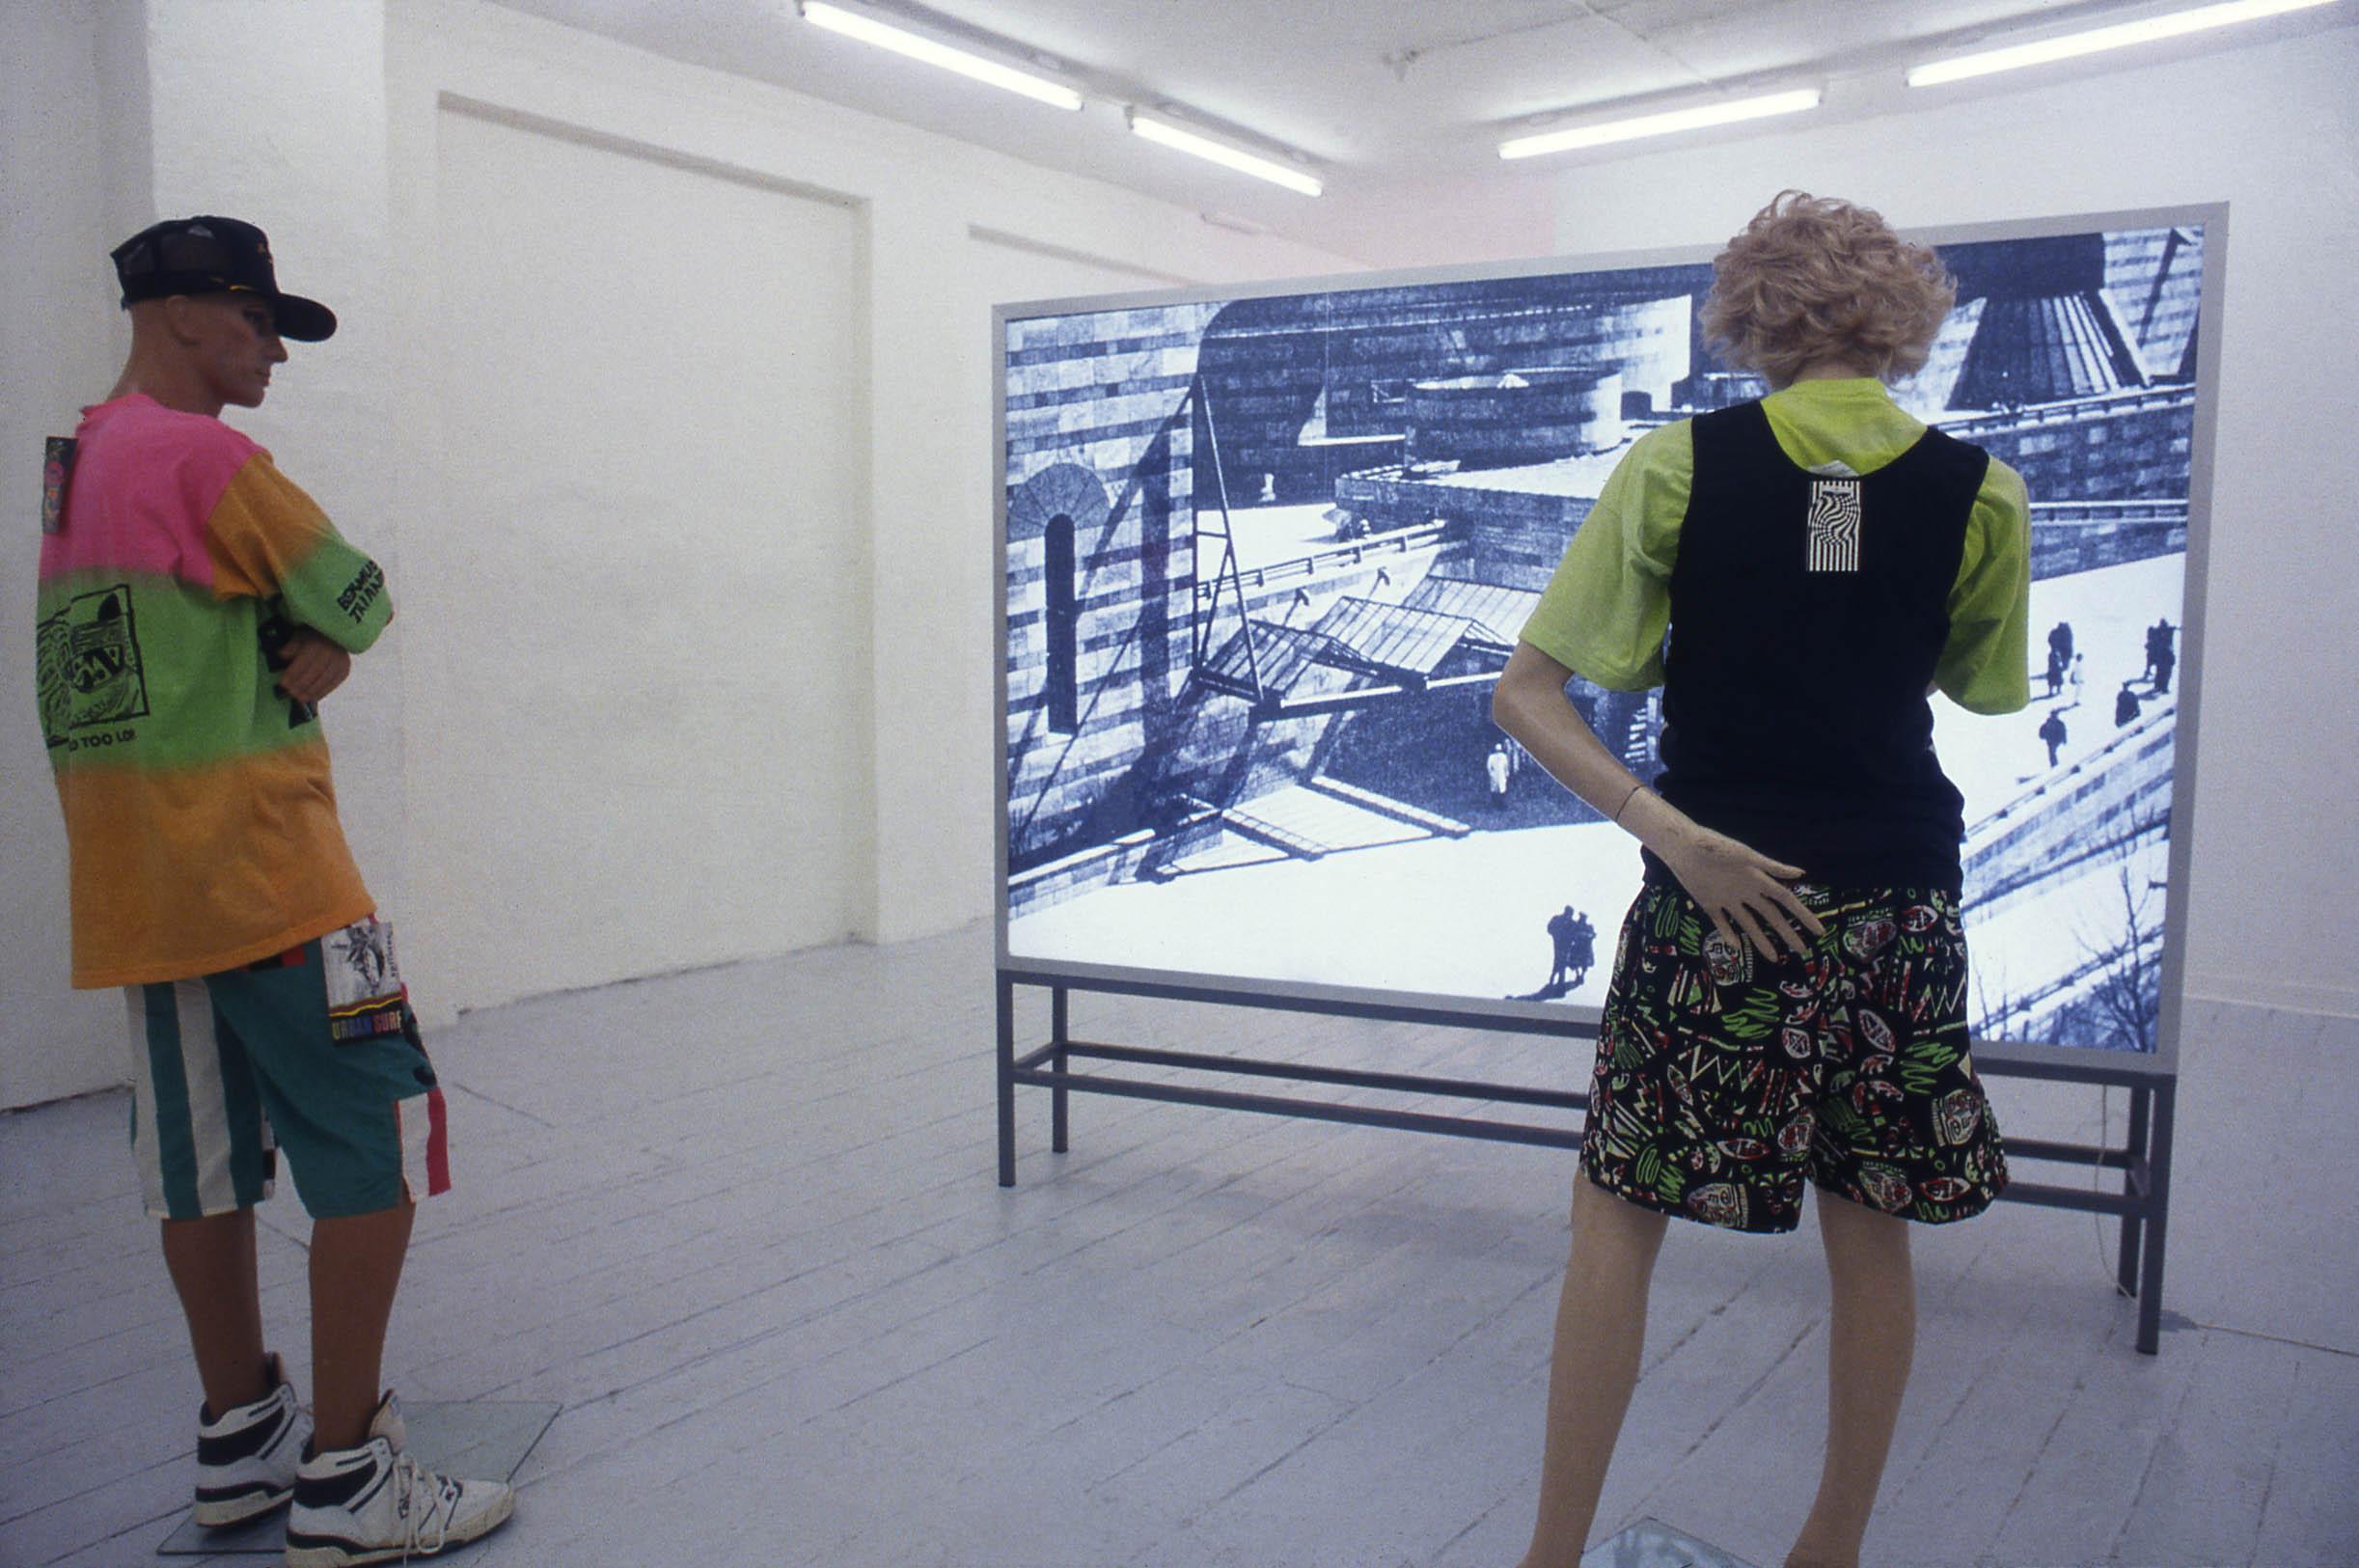 'EQUIVALENT' 1989 Double-sided lightbox, mannikins, fluorescent sportswear Installation 'SANS FRONTIÈRES' Globe Copenhagen 1993